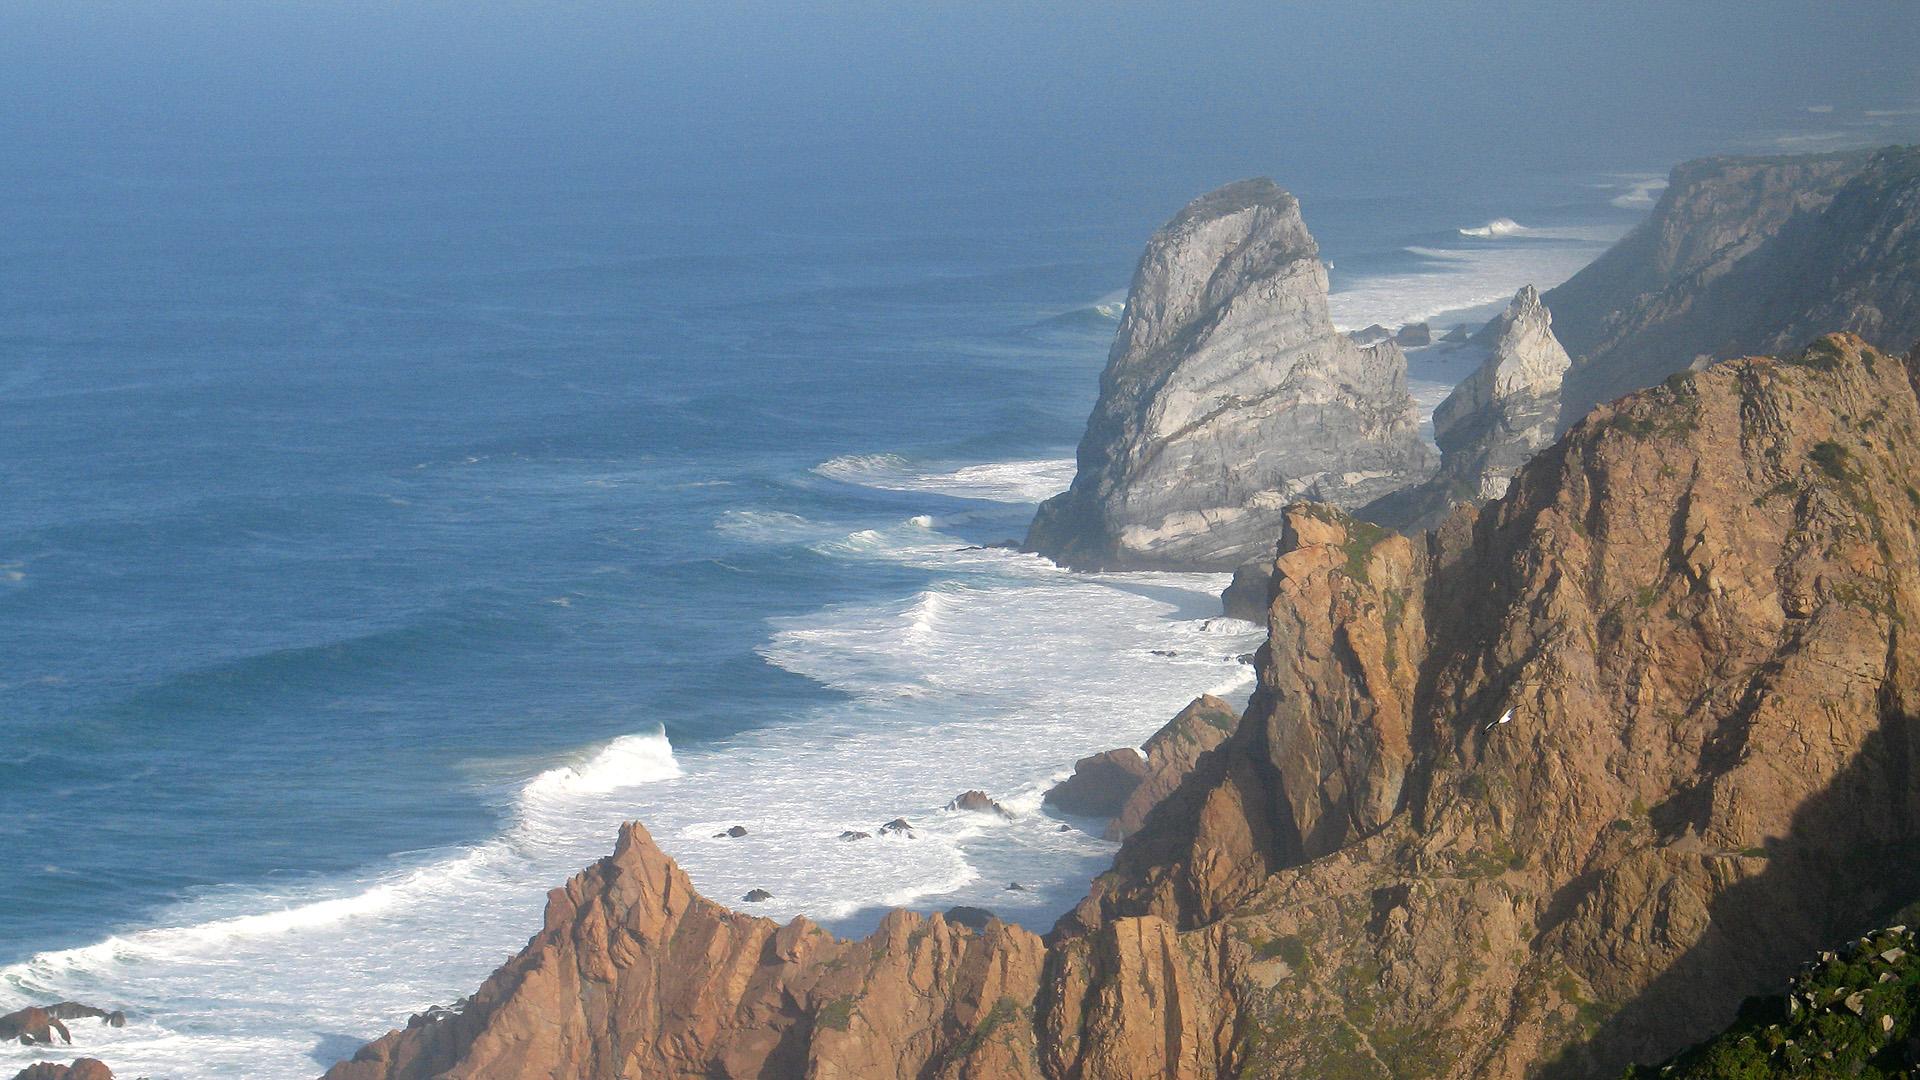 Sintra / Cabo da Roca